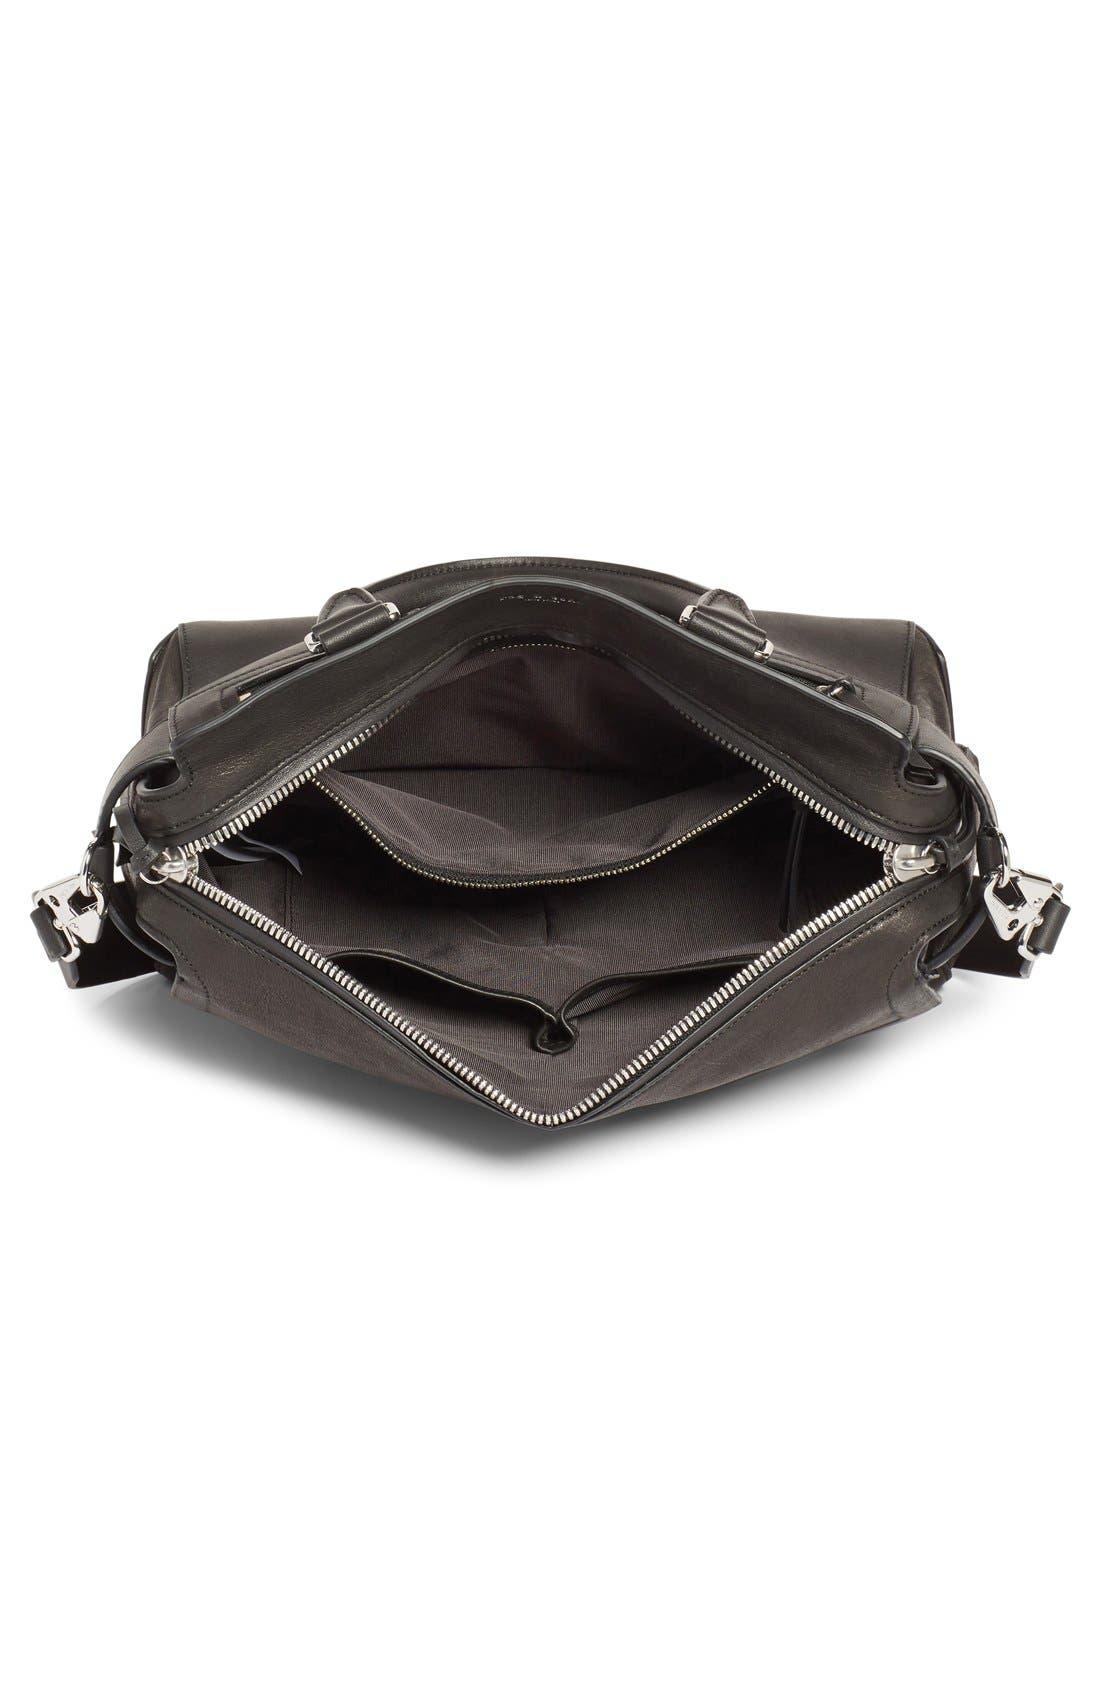 Alternate Image 3  - rag & bone 'Pilot' Lambskin Leather Satchel